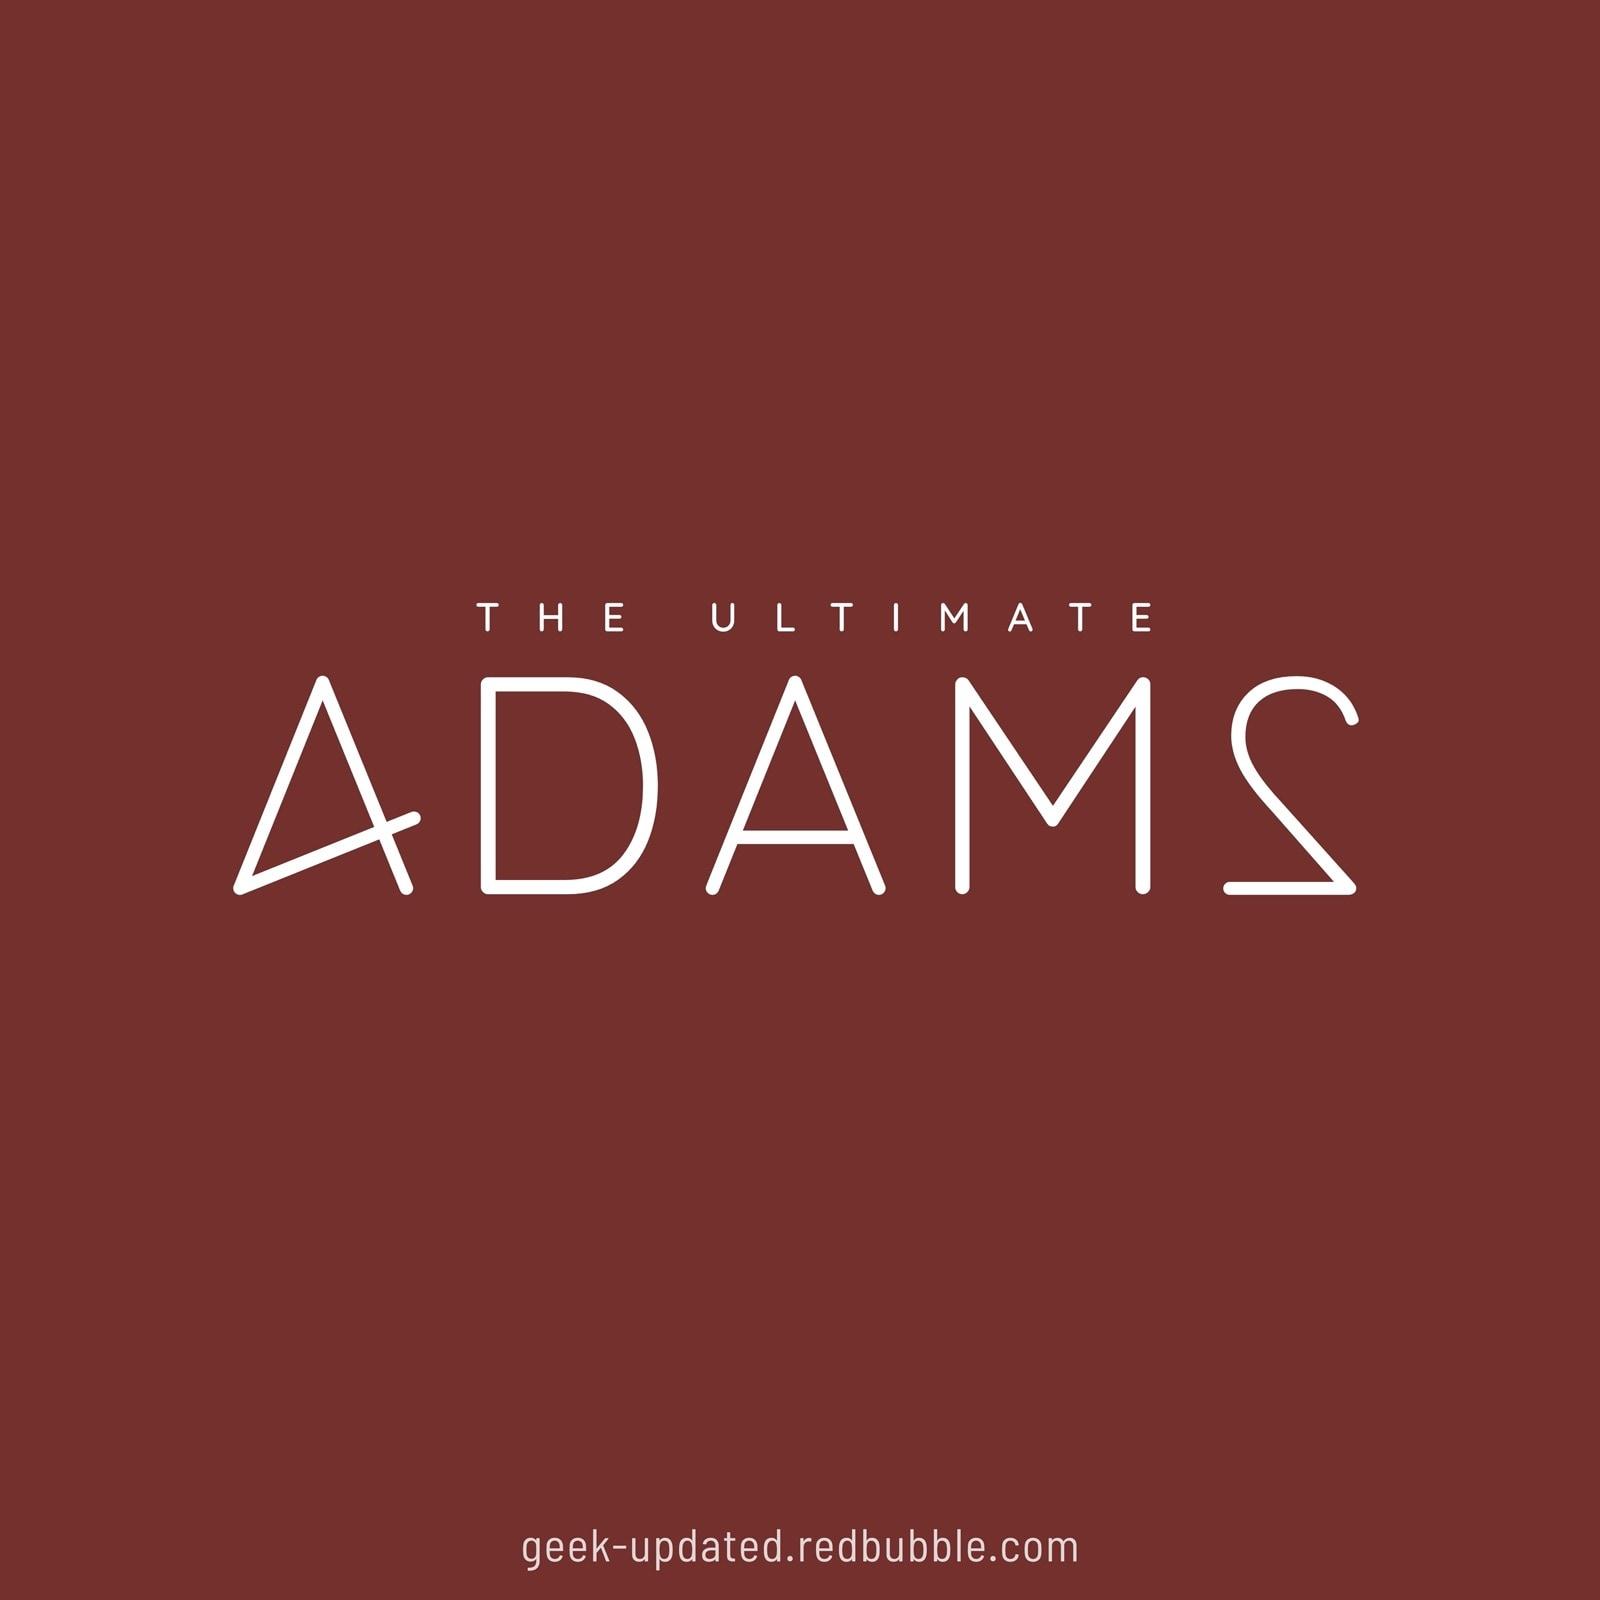 4DAM2 - the ultimate Douglas Adams 42 - design by Piotr Kowalczyk